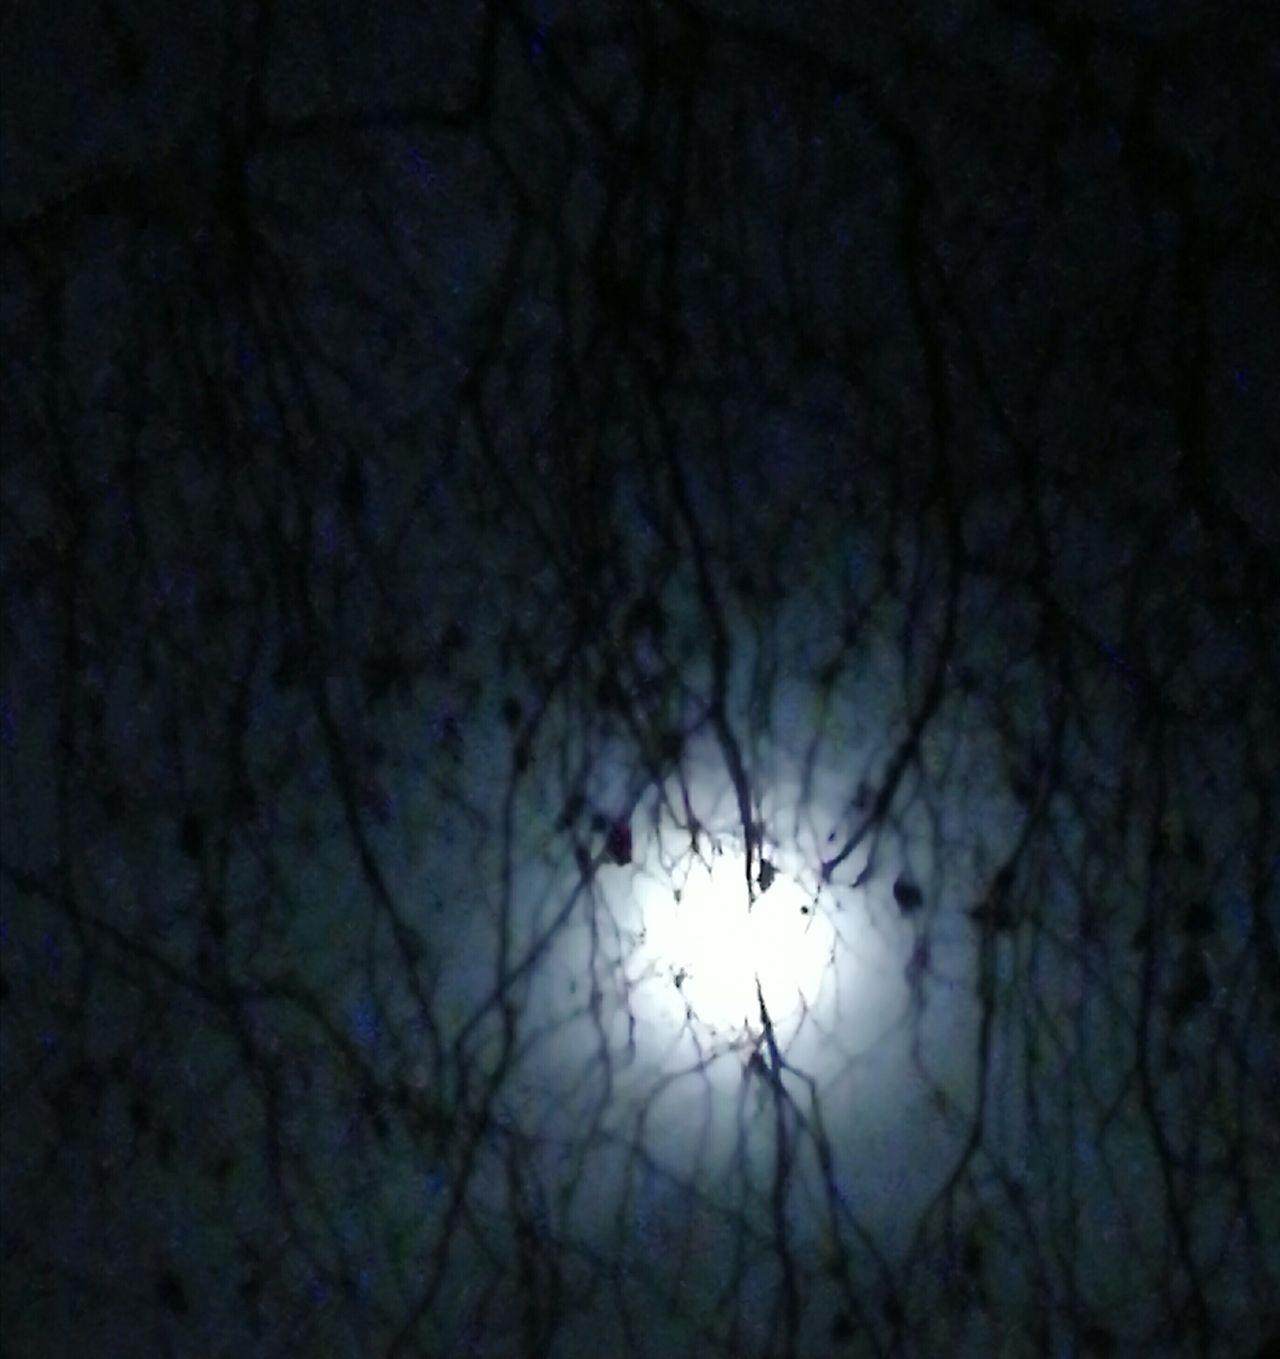 Nature Sky Night Outdoors Moonlight No People Taking Photos At Home LONDON❤ London London London!!! Illuminated Life Moon Tranquility Shiny Fantasy Dreaming Moon_lovers Nighttime Beauty In Nature Enjoying Life Moonlight ♥ Moonshot Moonbeauty Moon_awards City